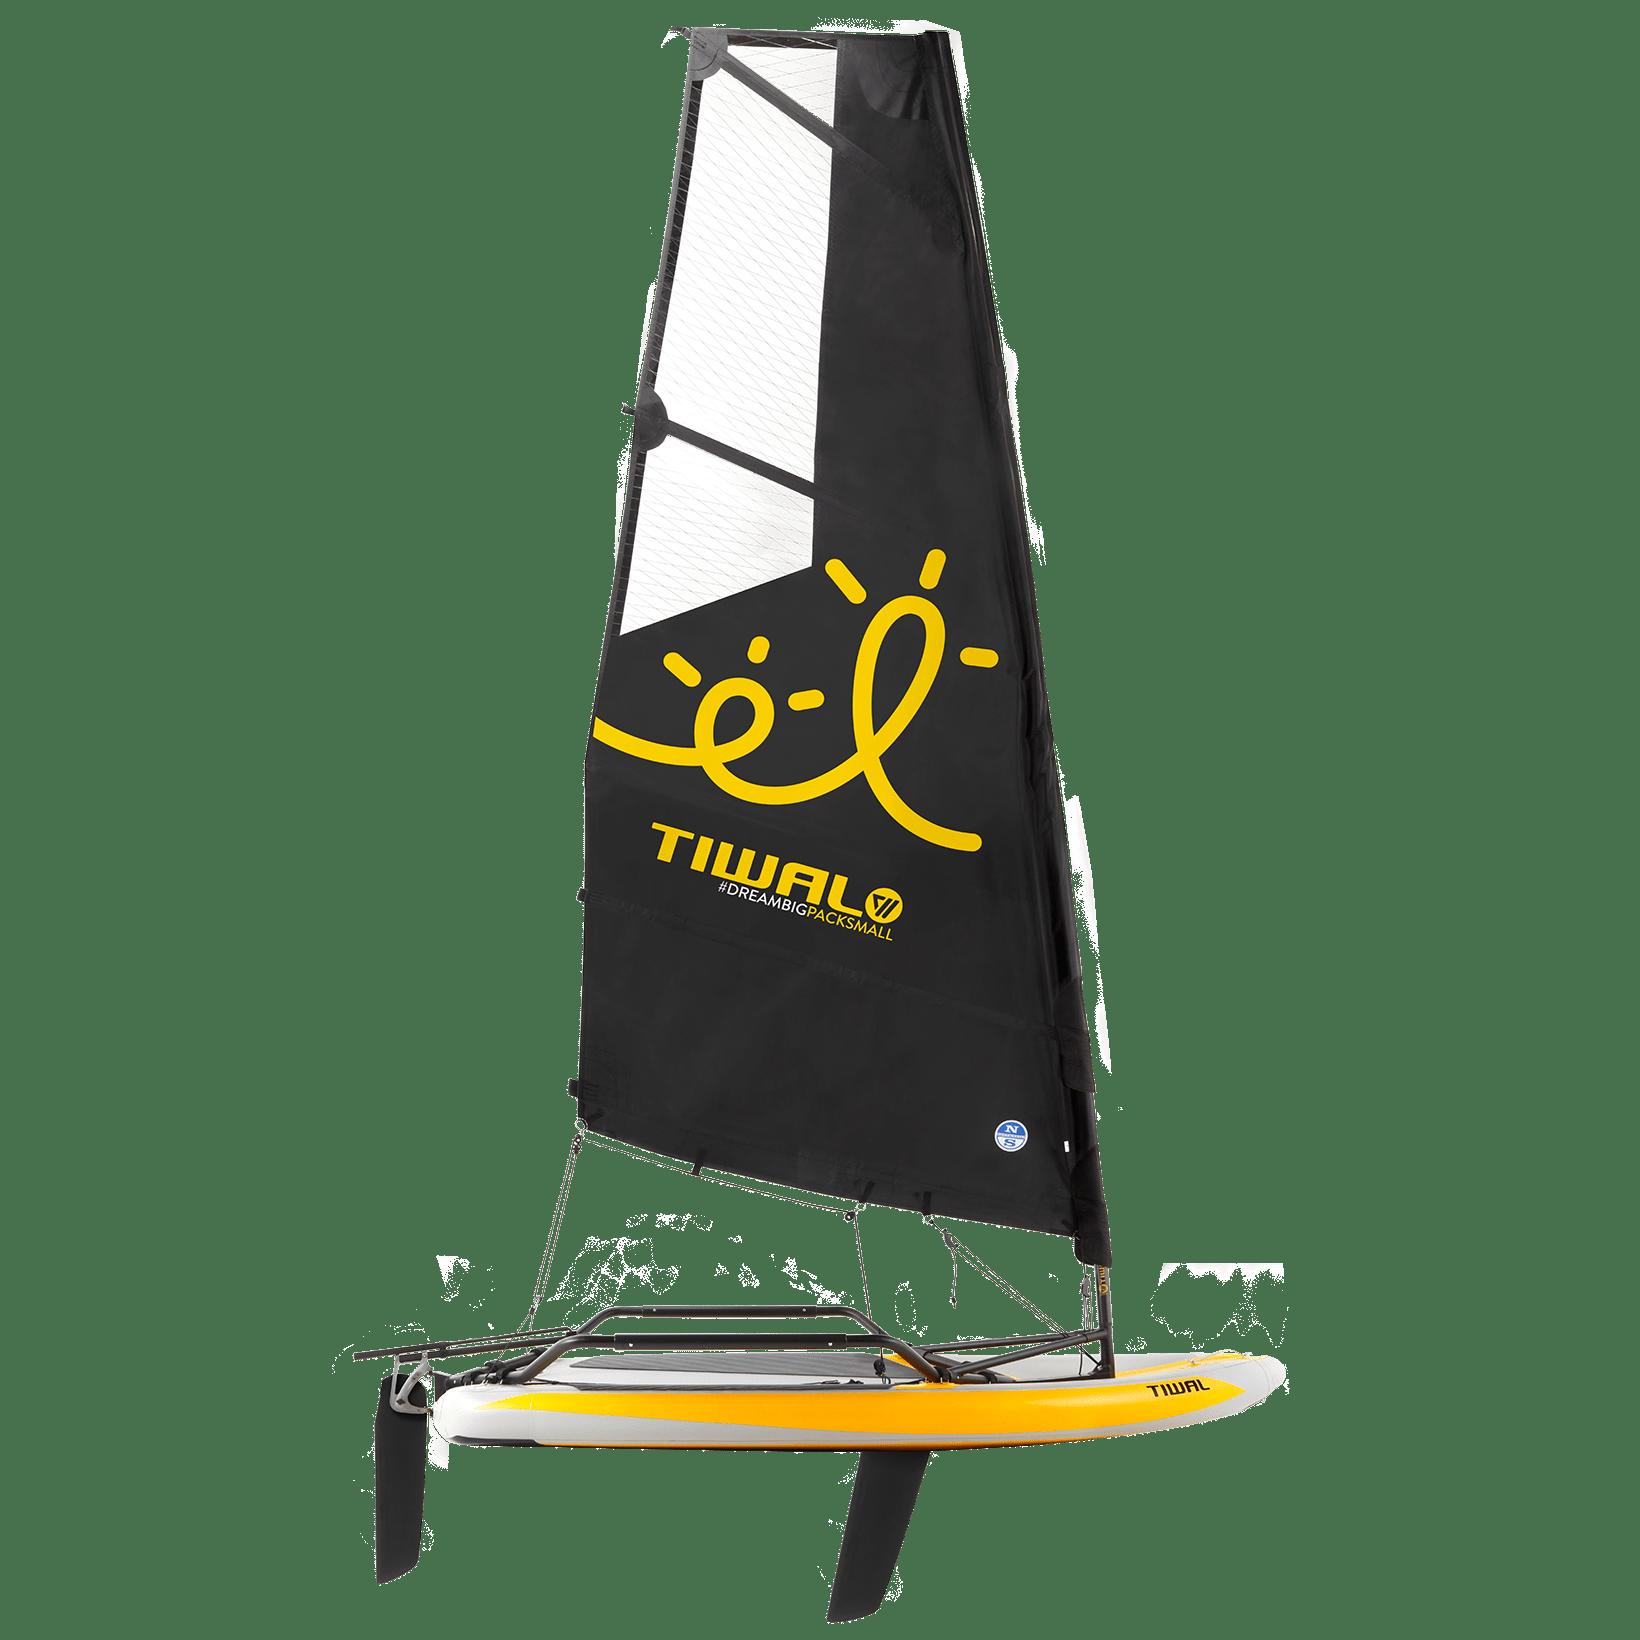 Tiwal3 Sailboat with Reefable Sail